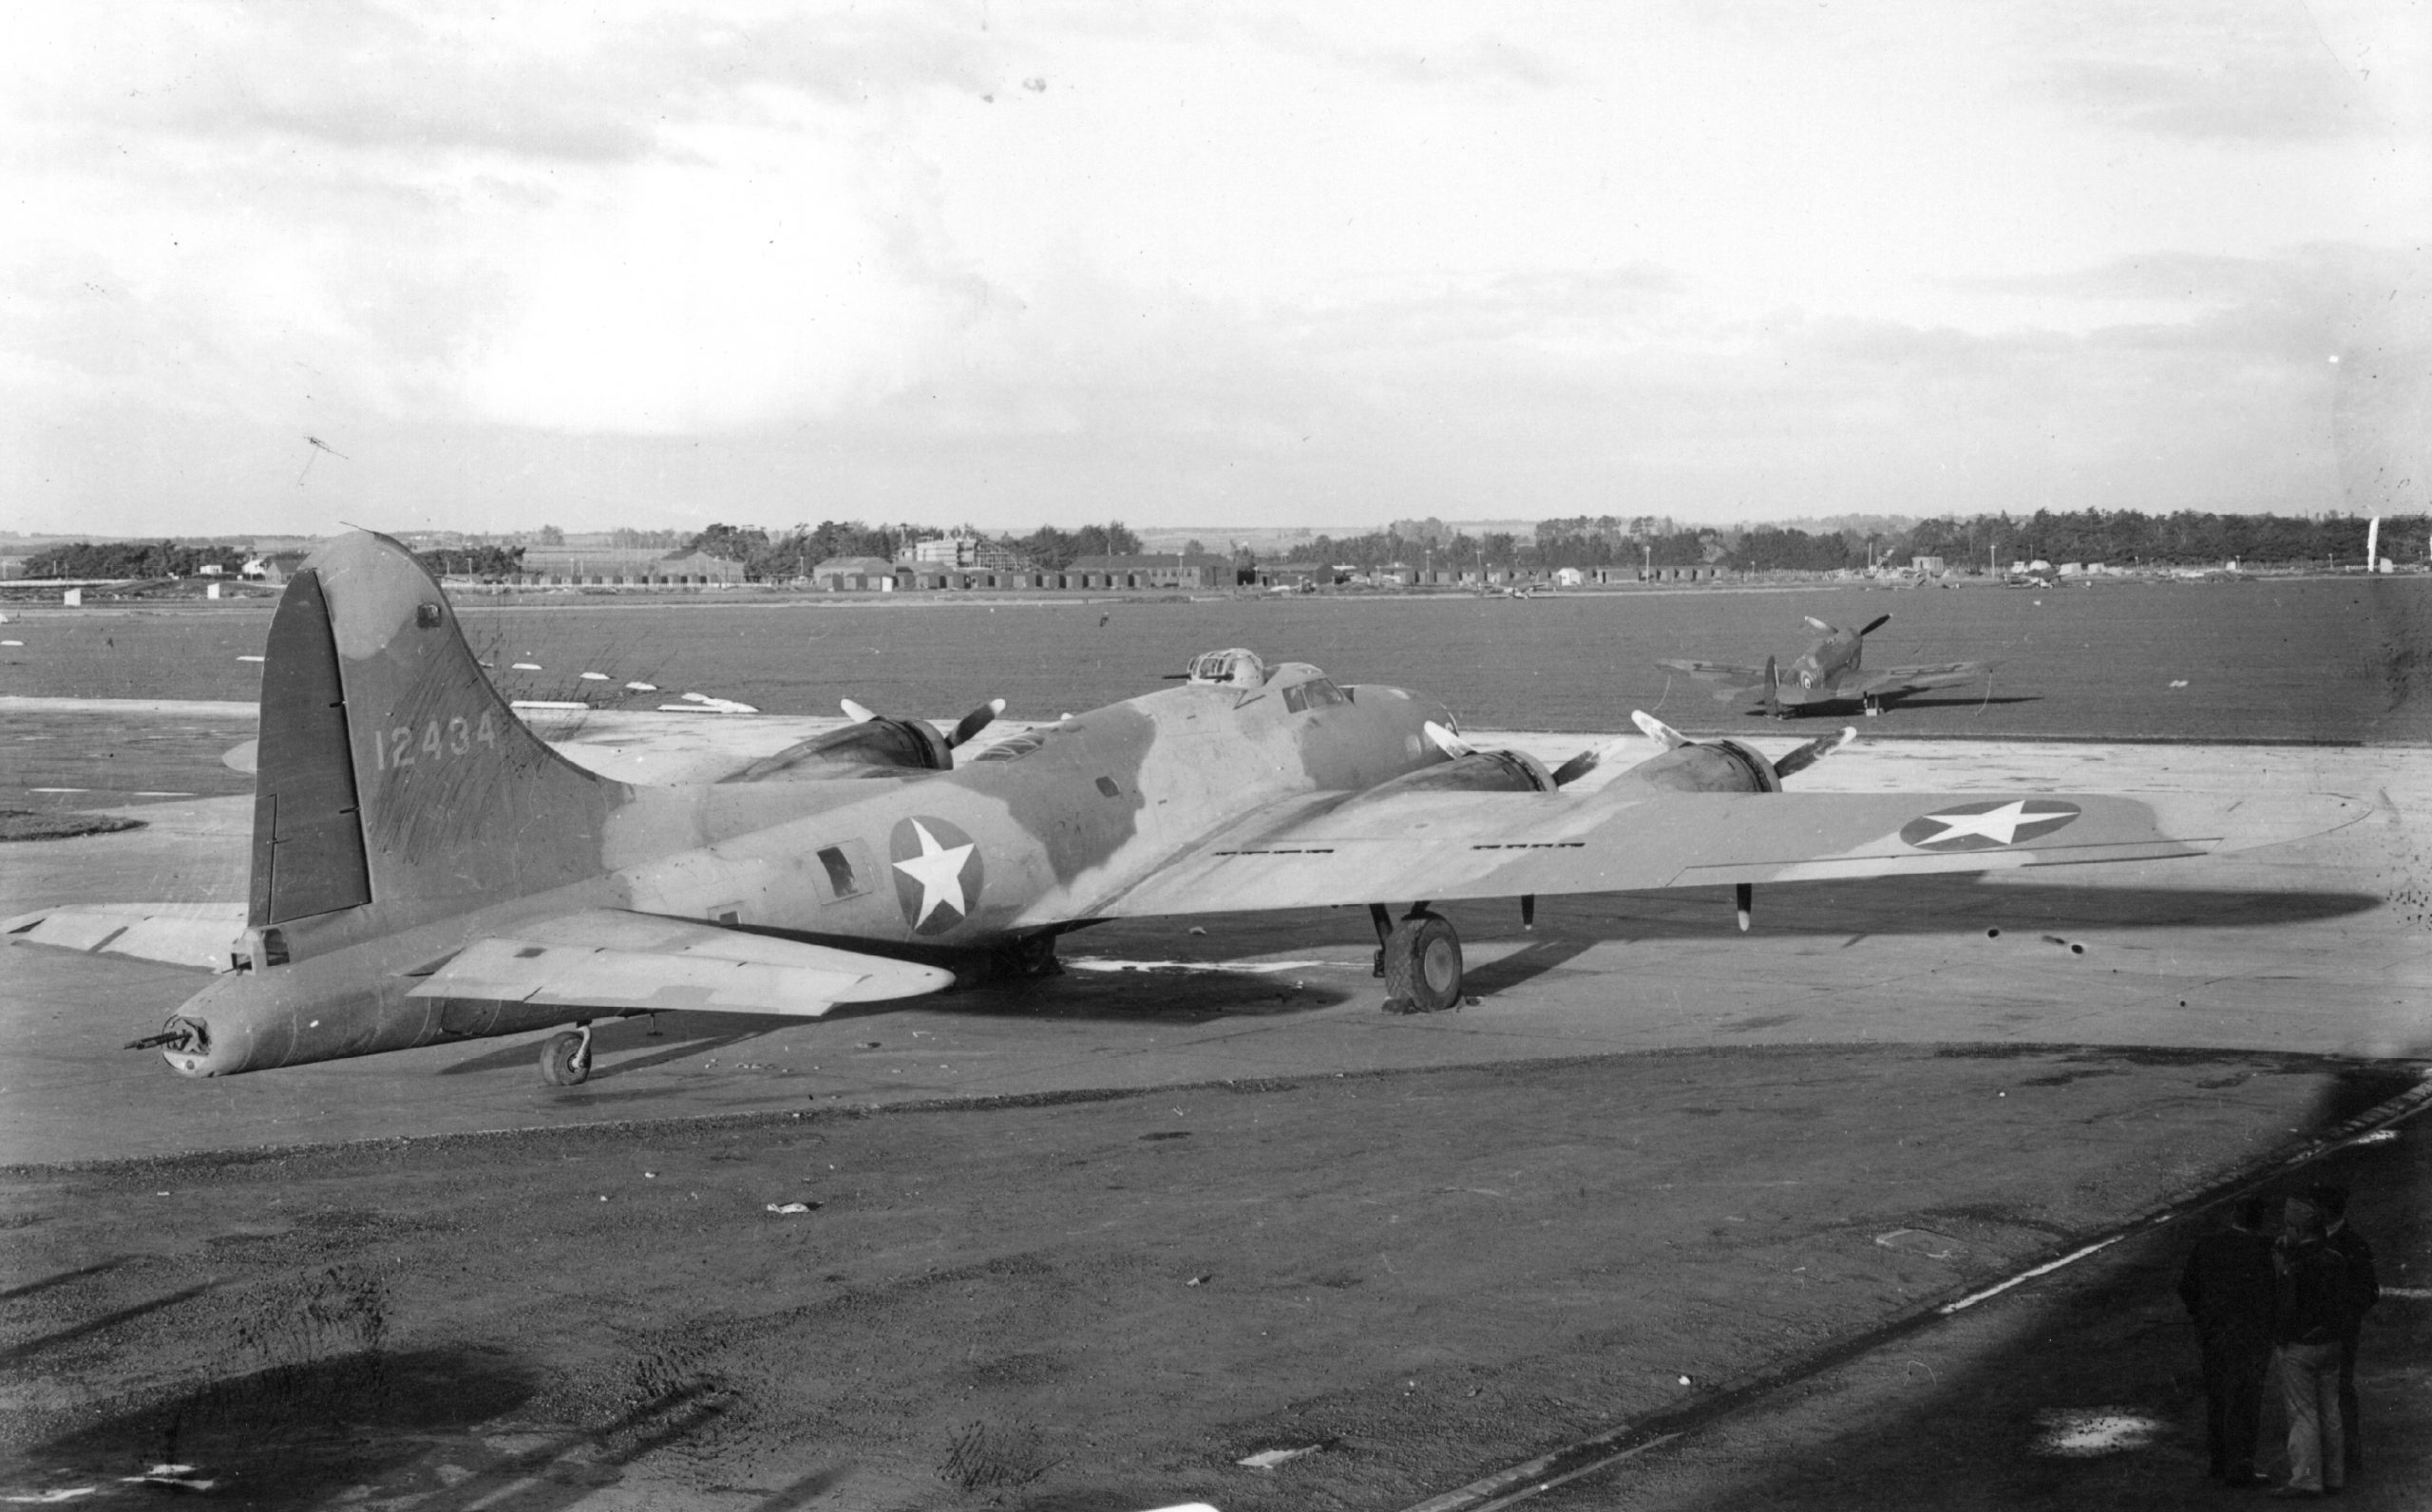 B-17 #41-2434